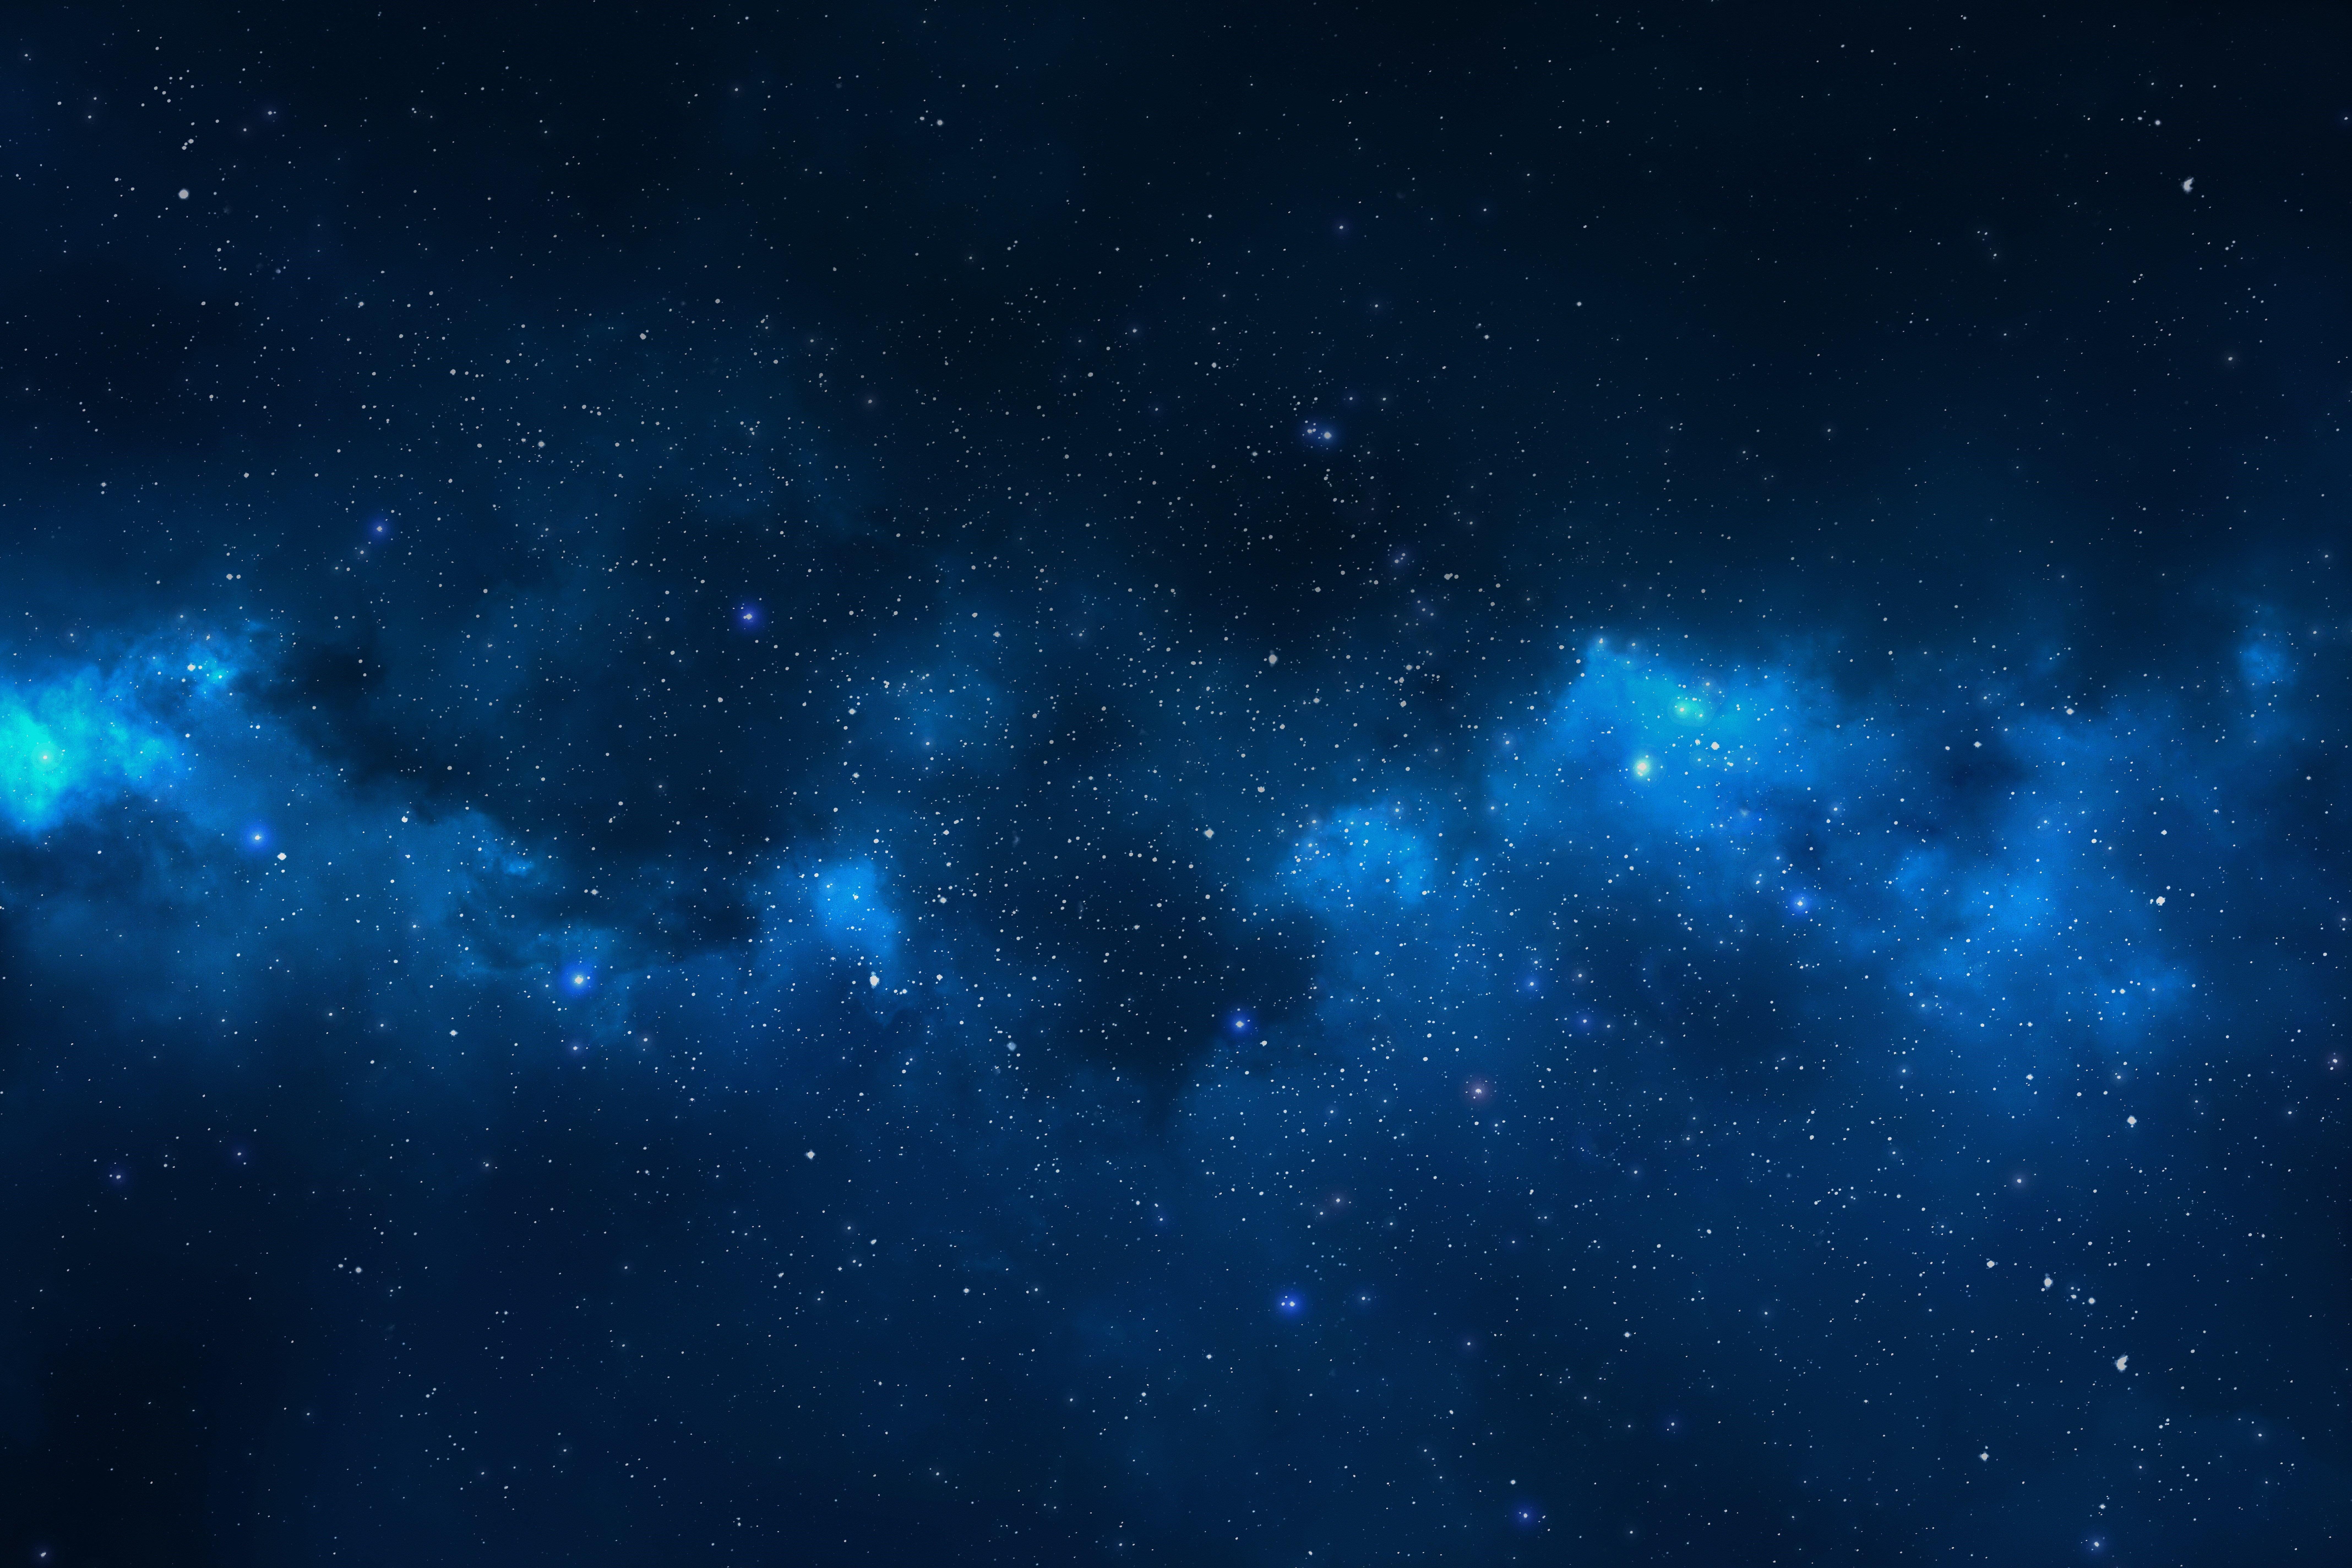 Wallpaper Universe - Interstellar space